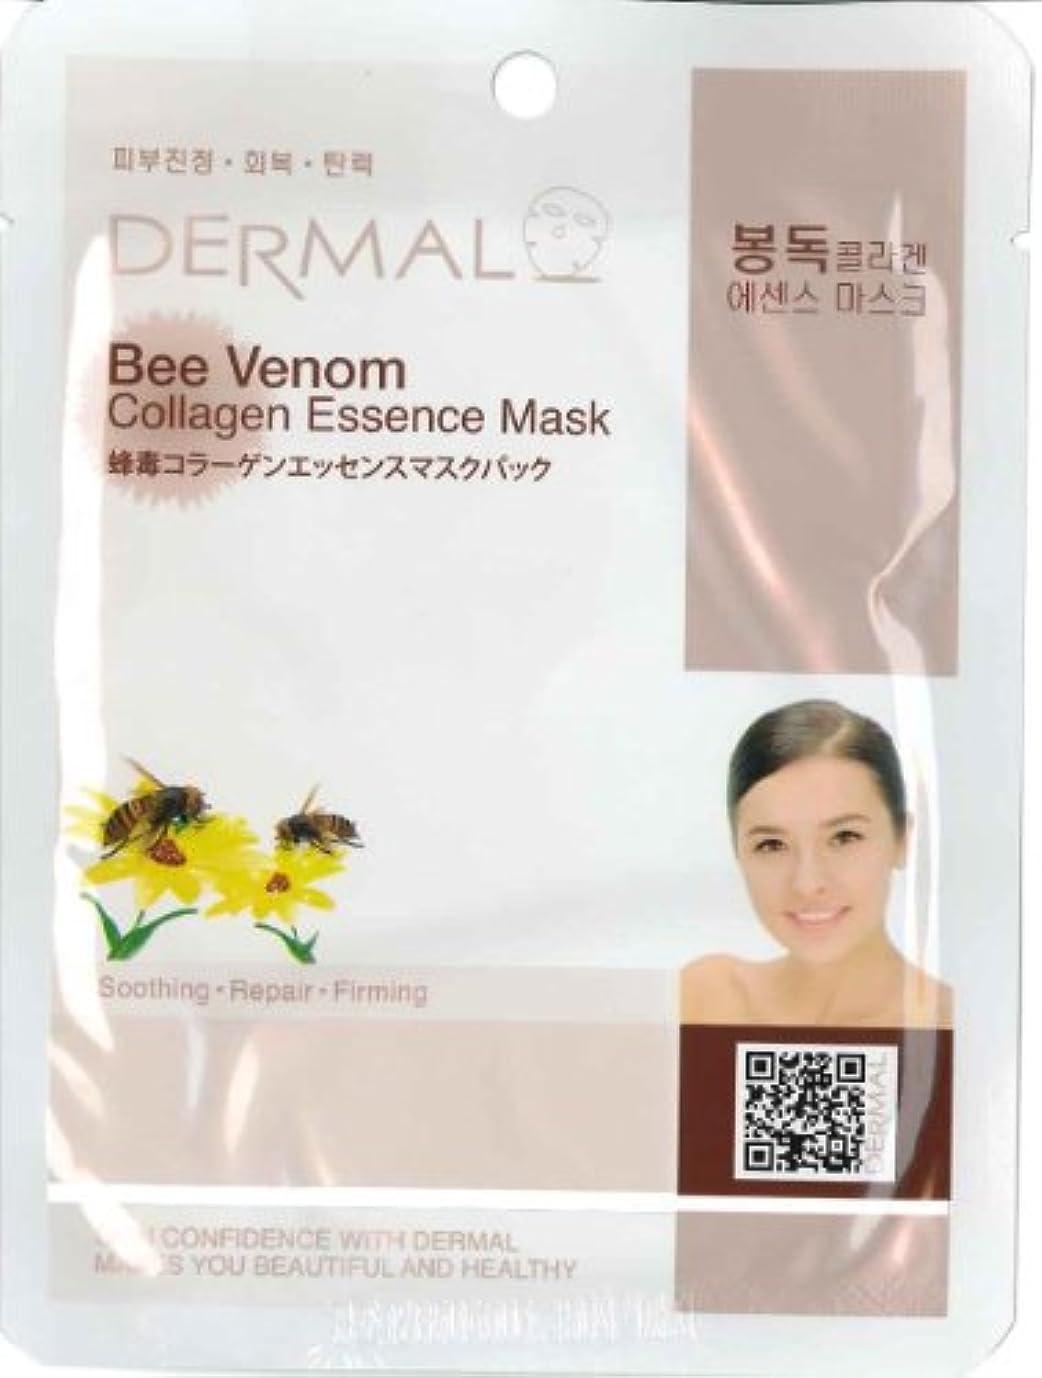 Dermal(ダーマル) 蜂毒(フェイスパック) ミツバチ毒 シートマスク 10枚